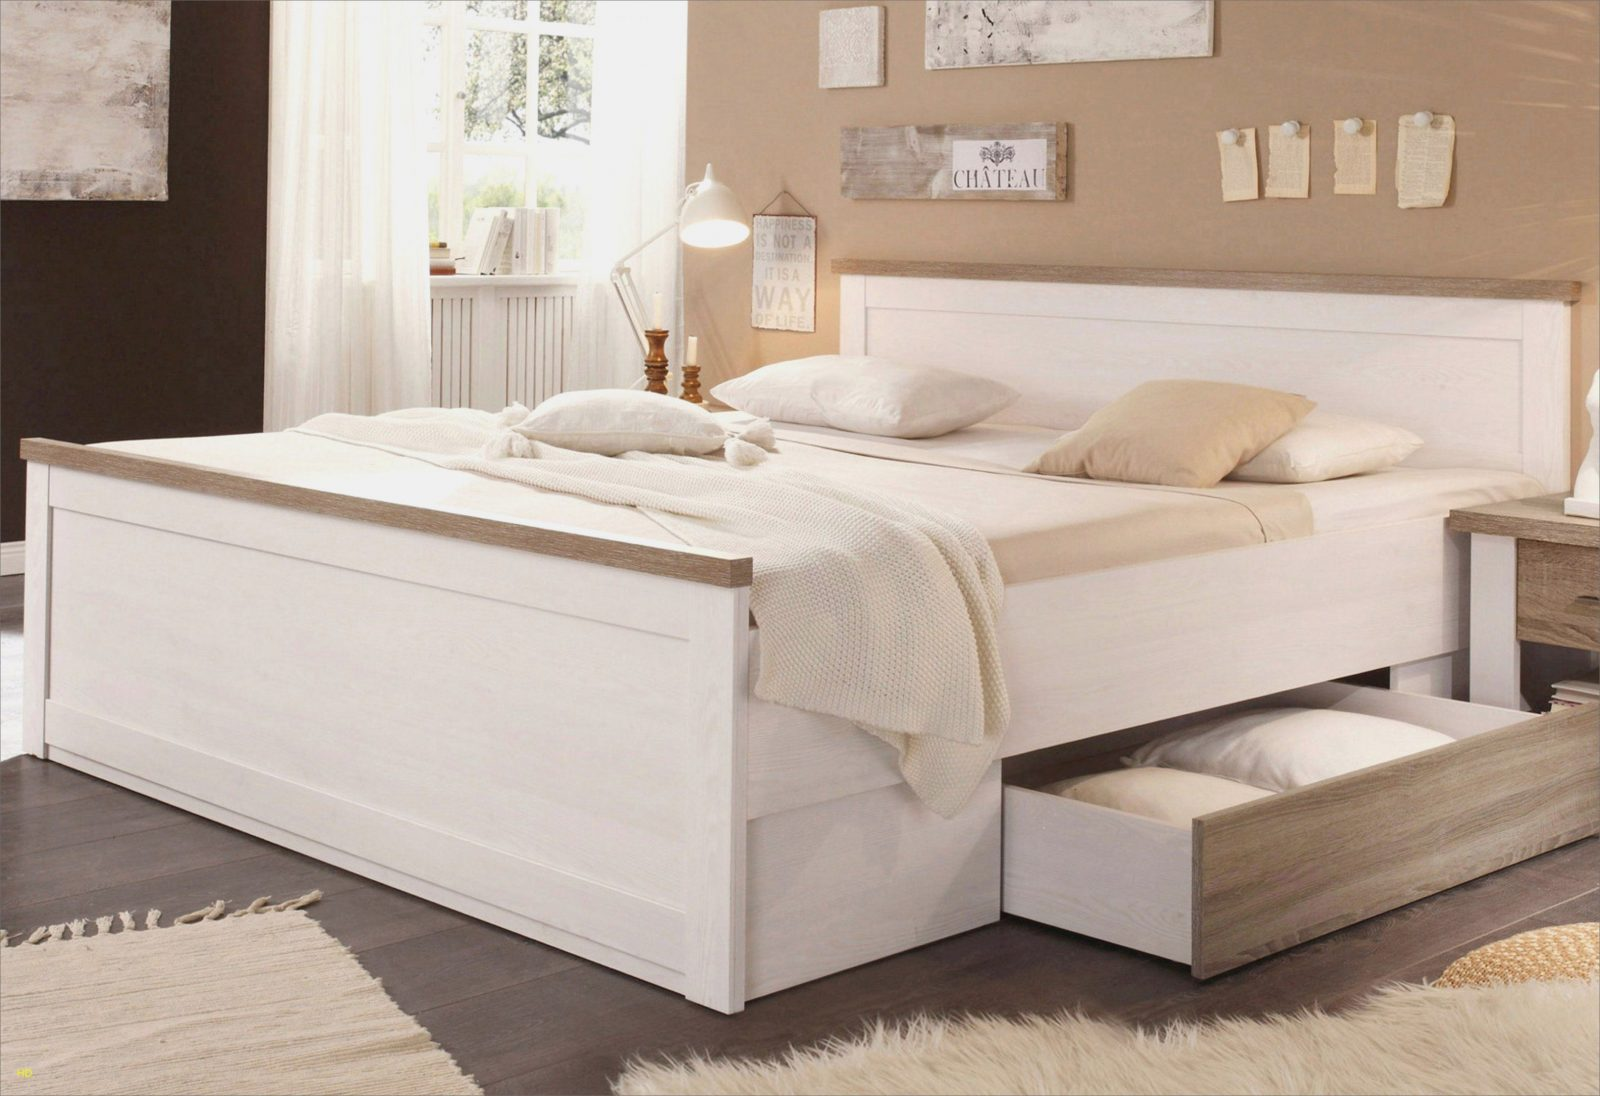 Bett Mit Gästebett Ikea Beeindruckend Ikea Betten Weiß Rabogd Für von Kinderbett Mit Gästebett Ikea Bild